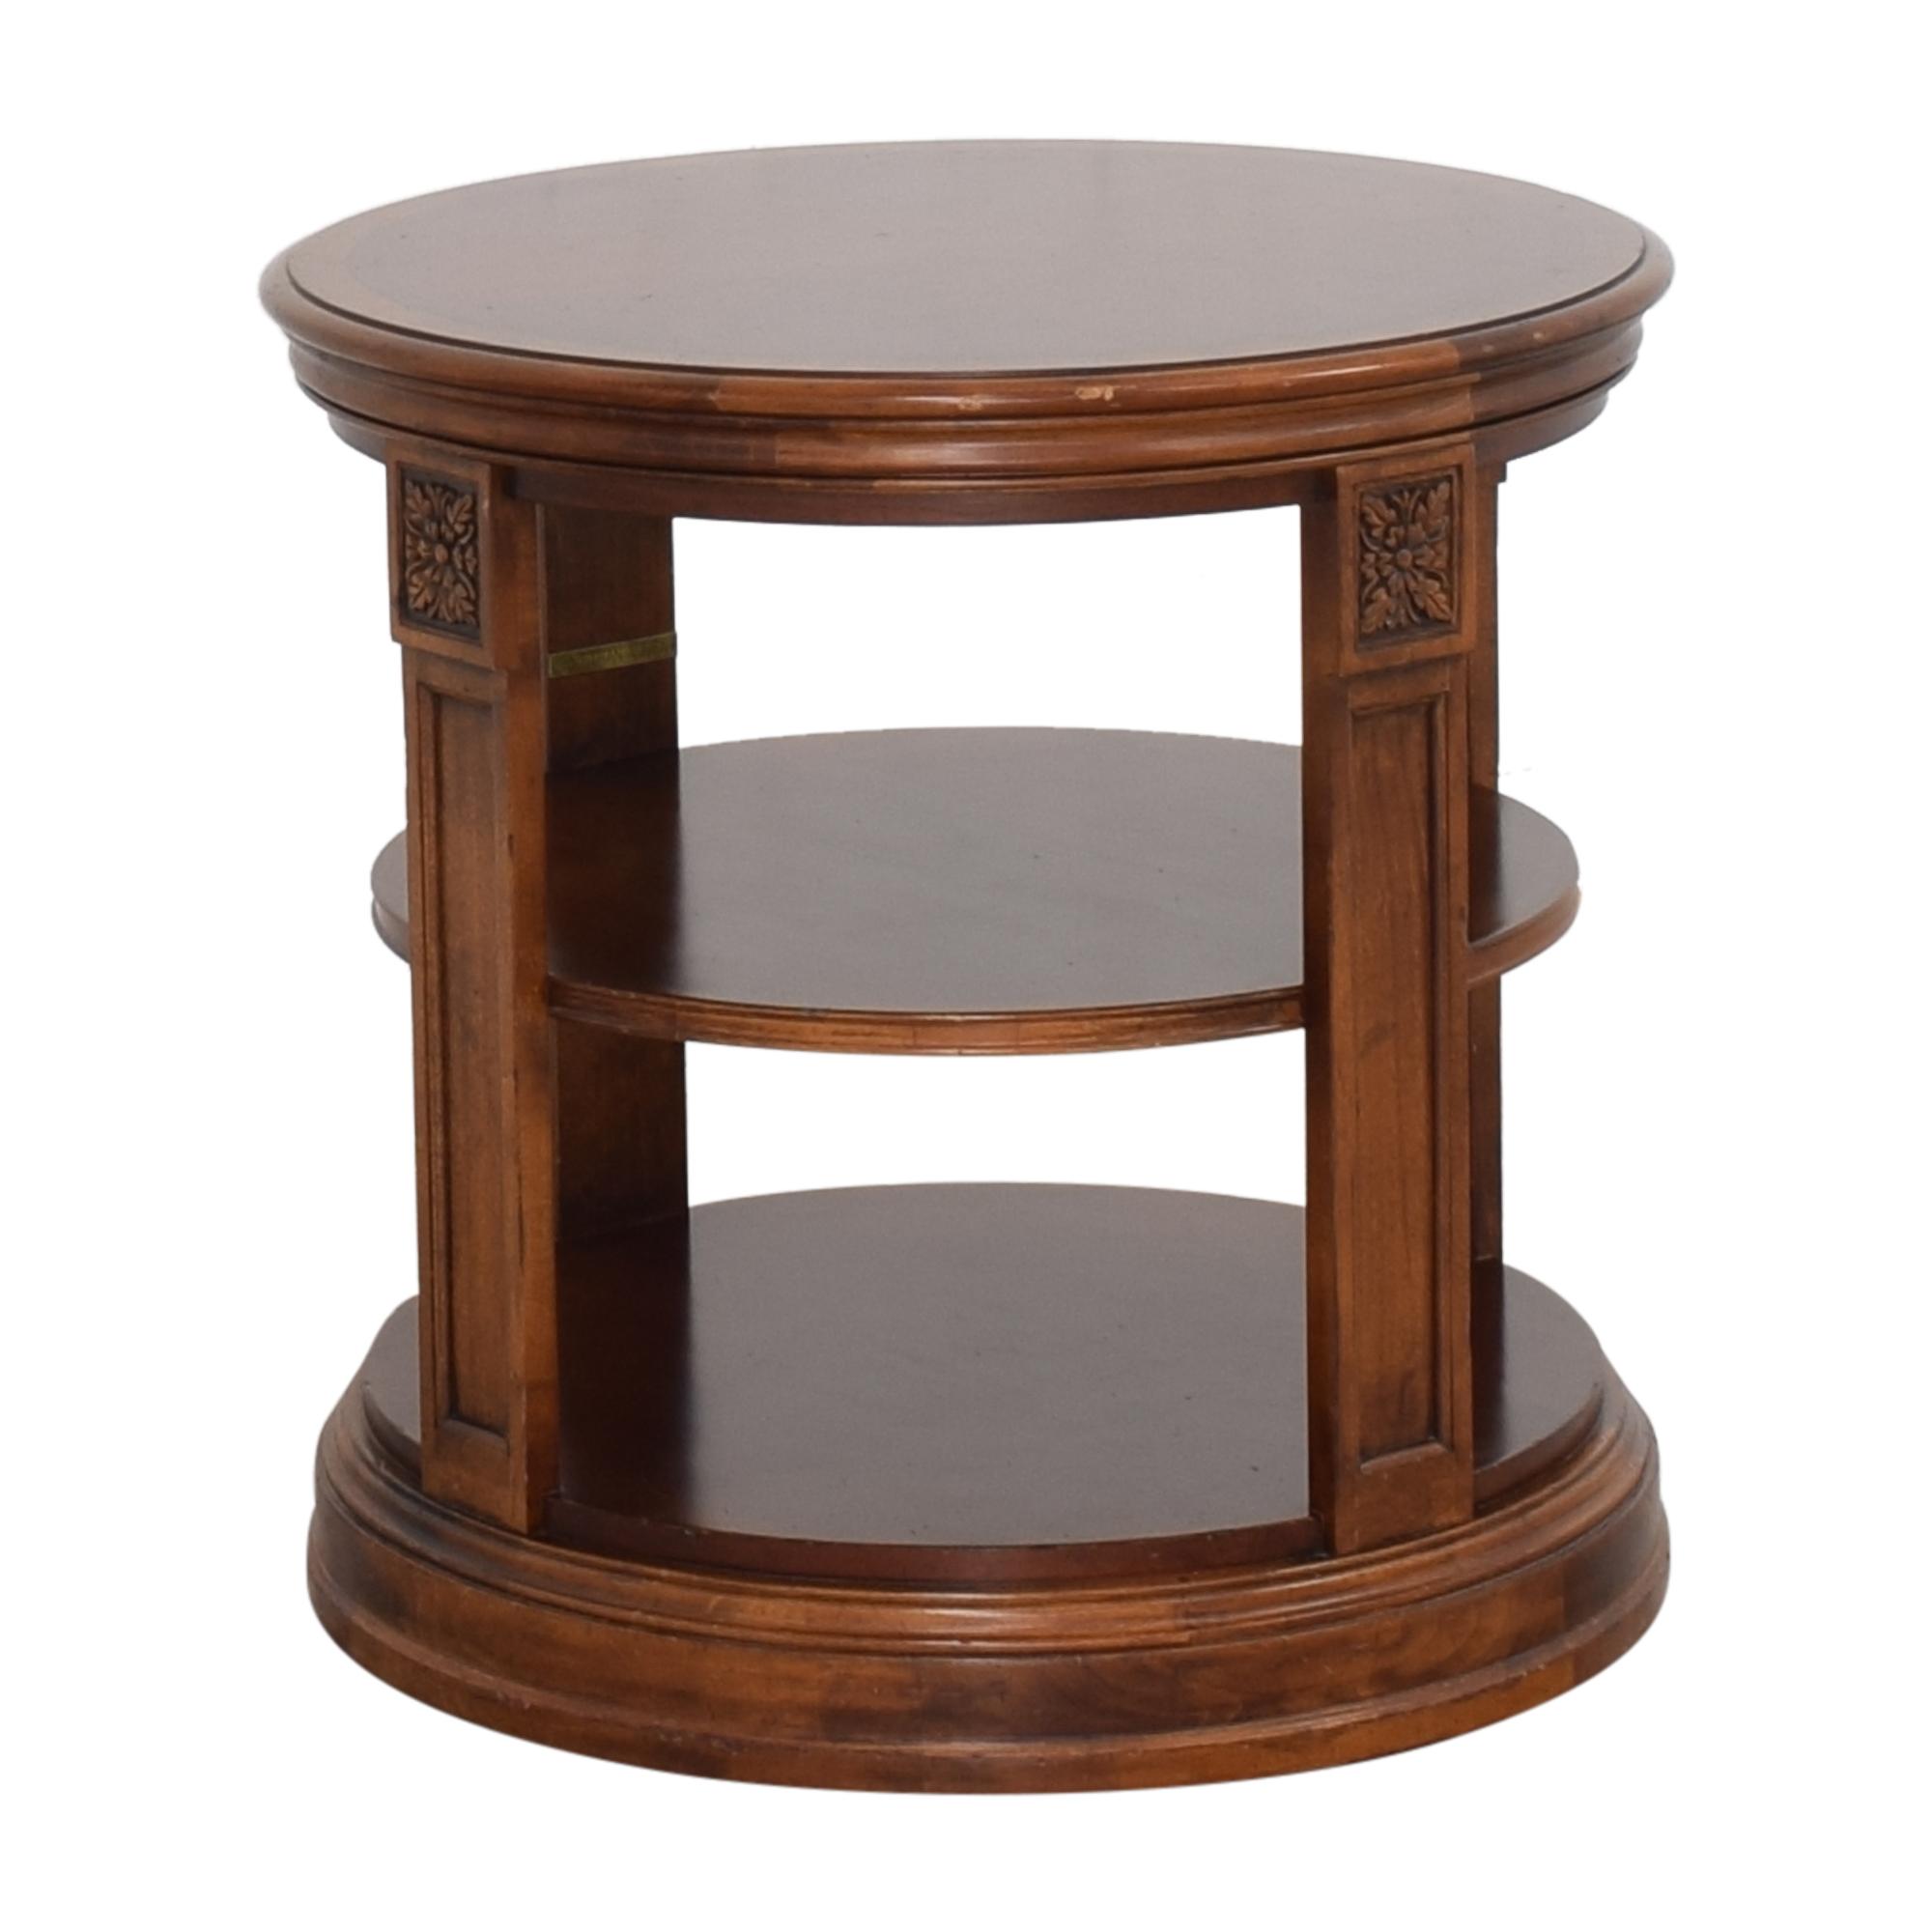 Ethan Allen Ethan Allen Seaver Library Table for sale